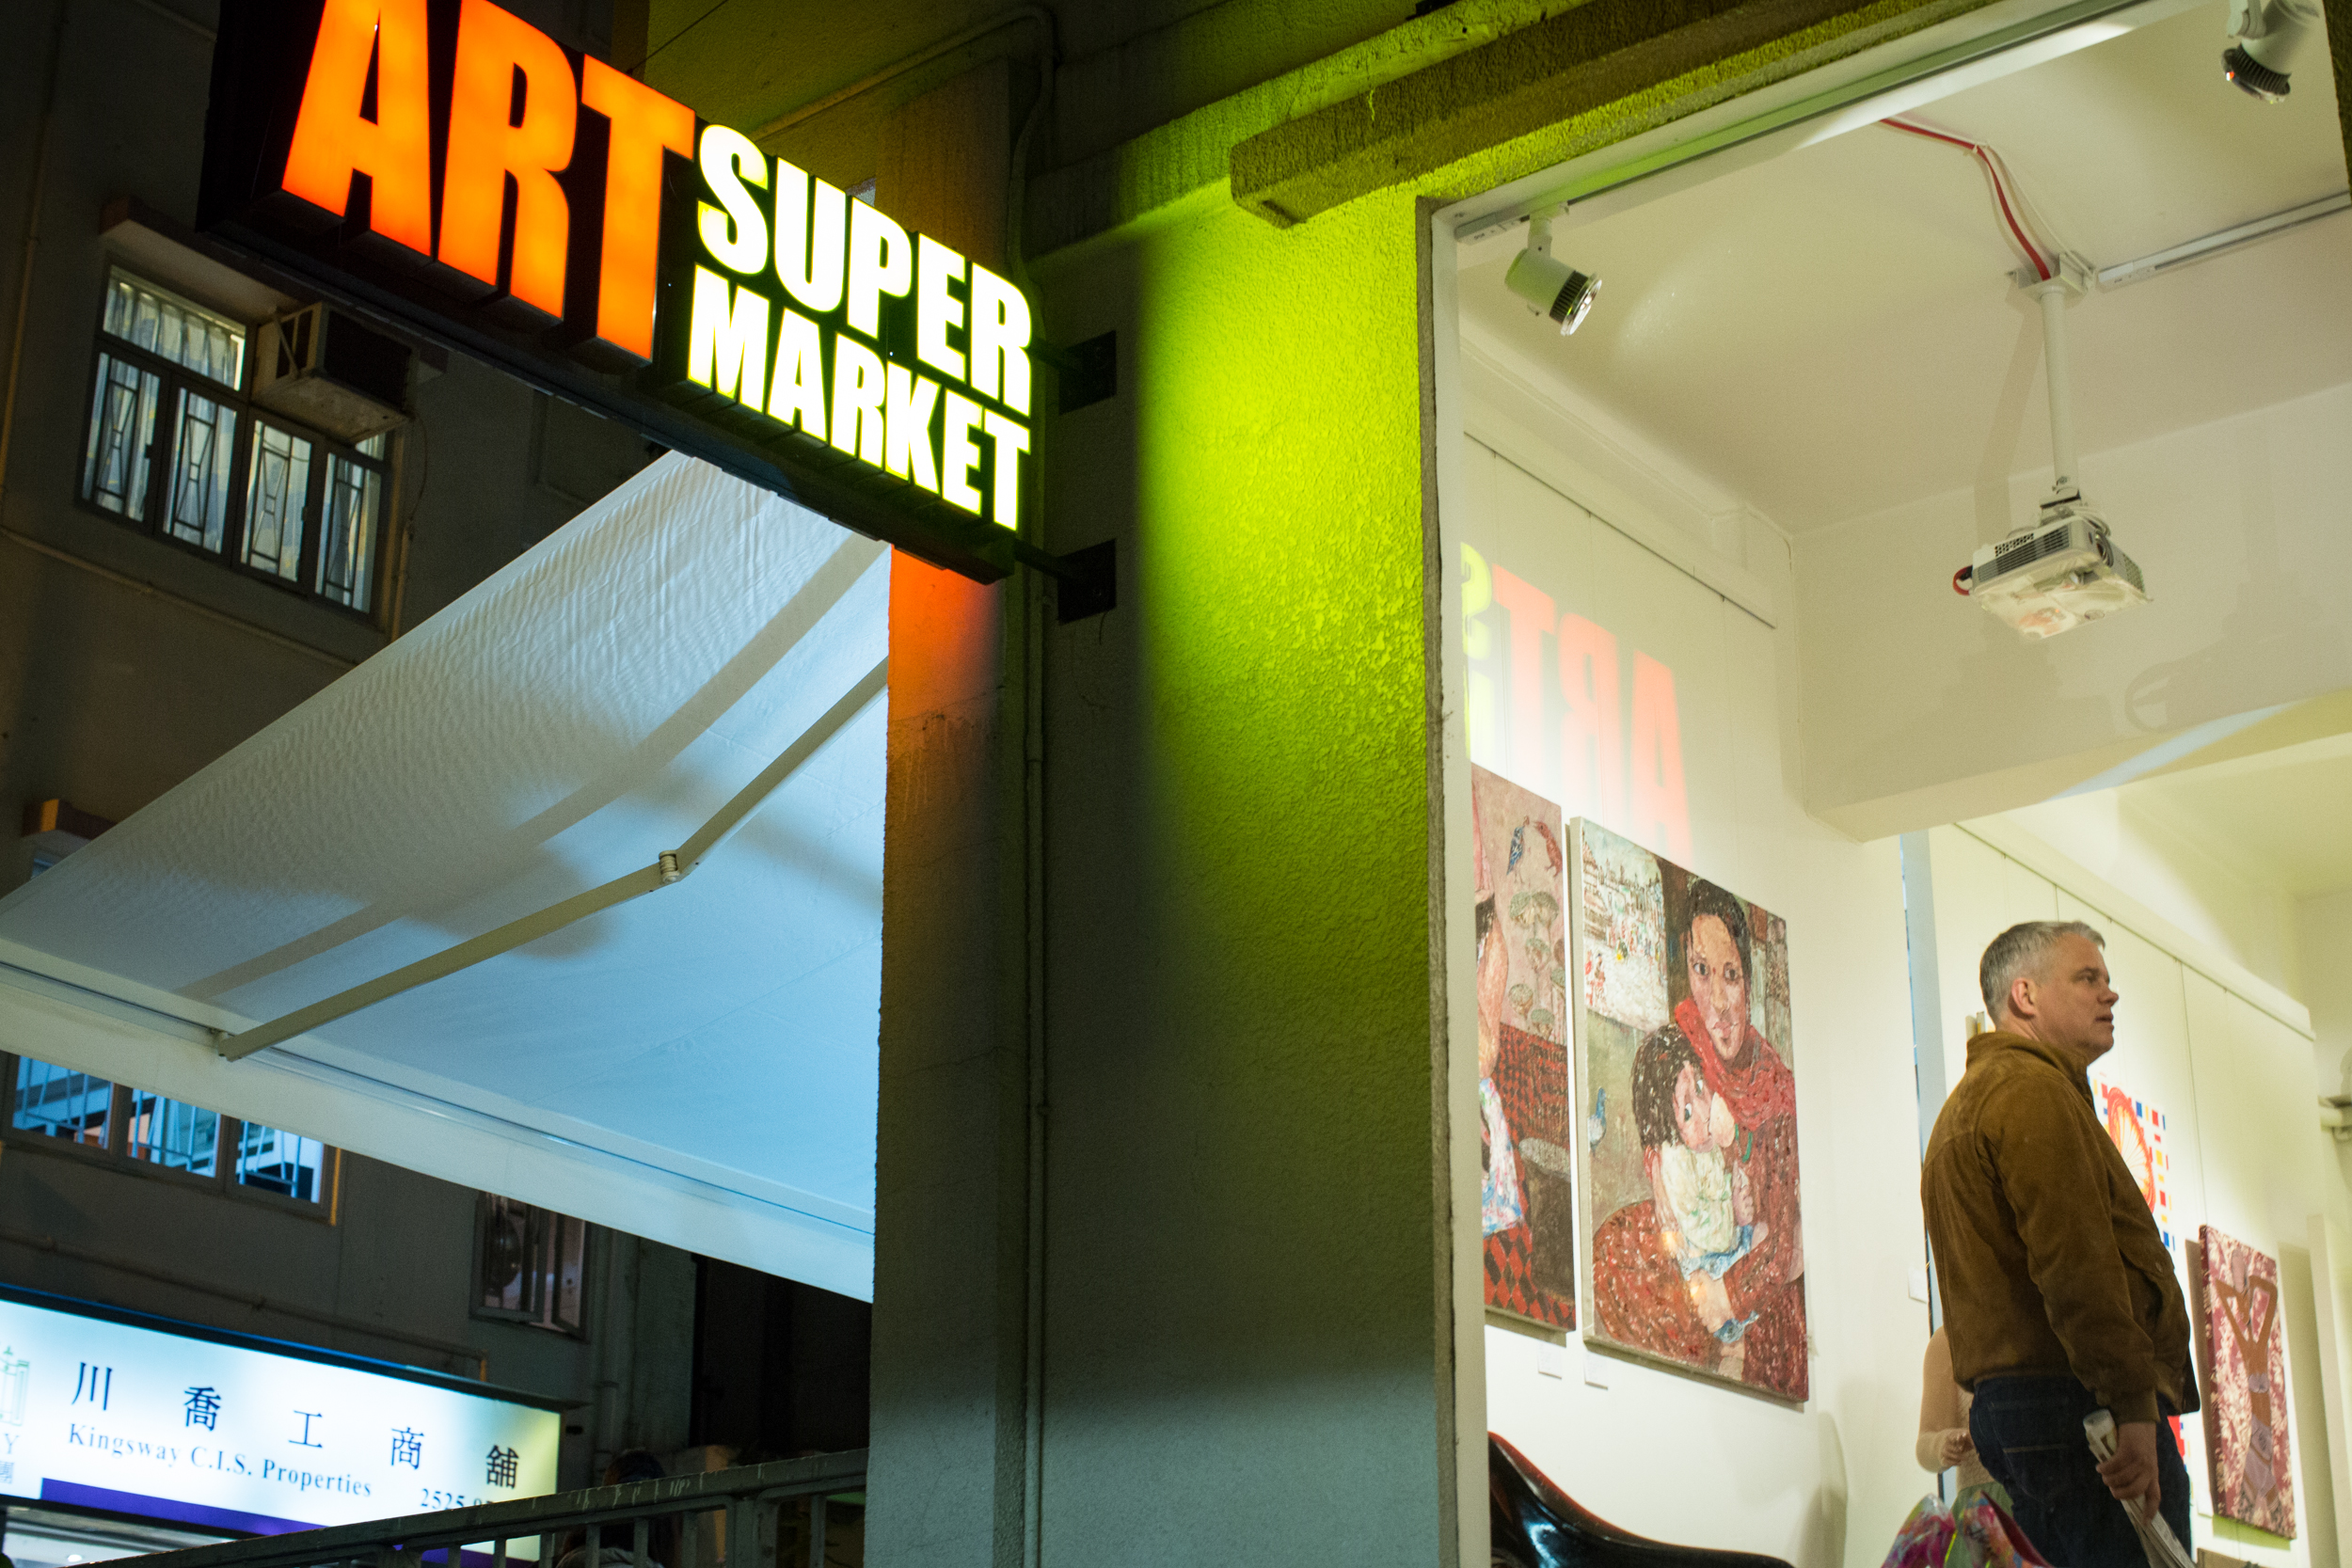 ArtSupermarket+Event+Feb2014-1-3085024481-O.jpg